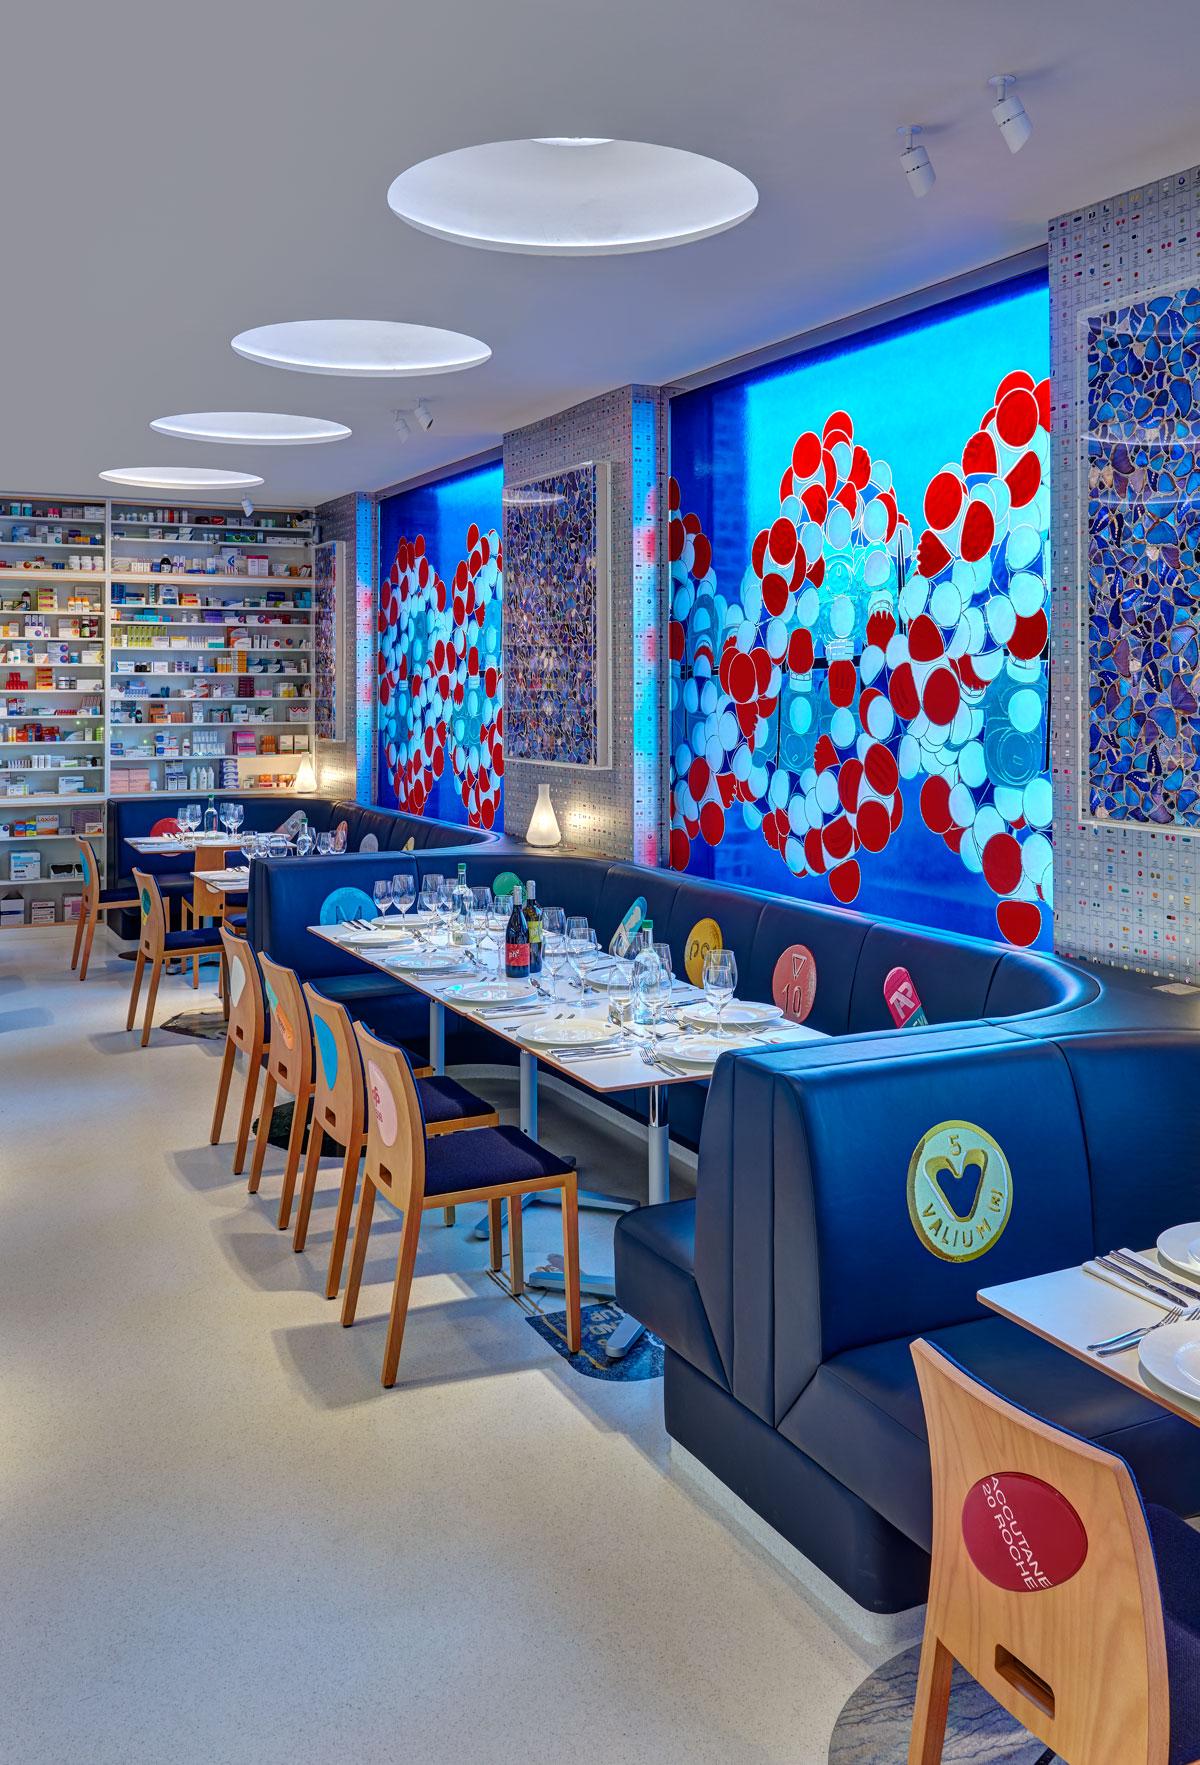 Damien Hirst Prescribes A Dose Of Fine Art At Pharmacy 2 Restaurant Interior Design Magazine